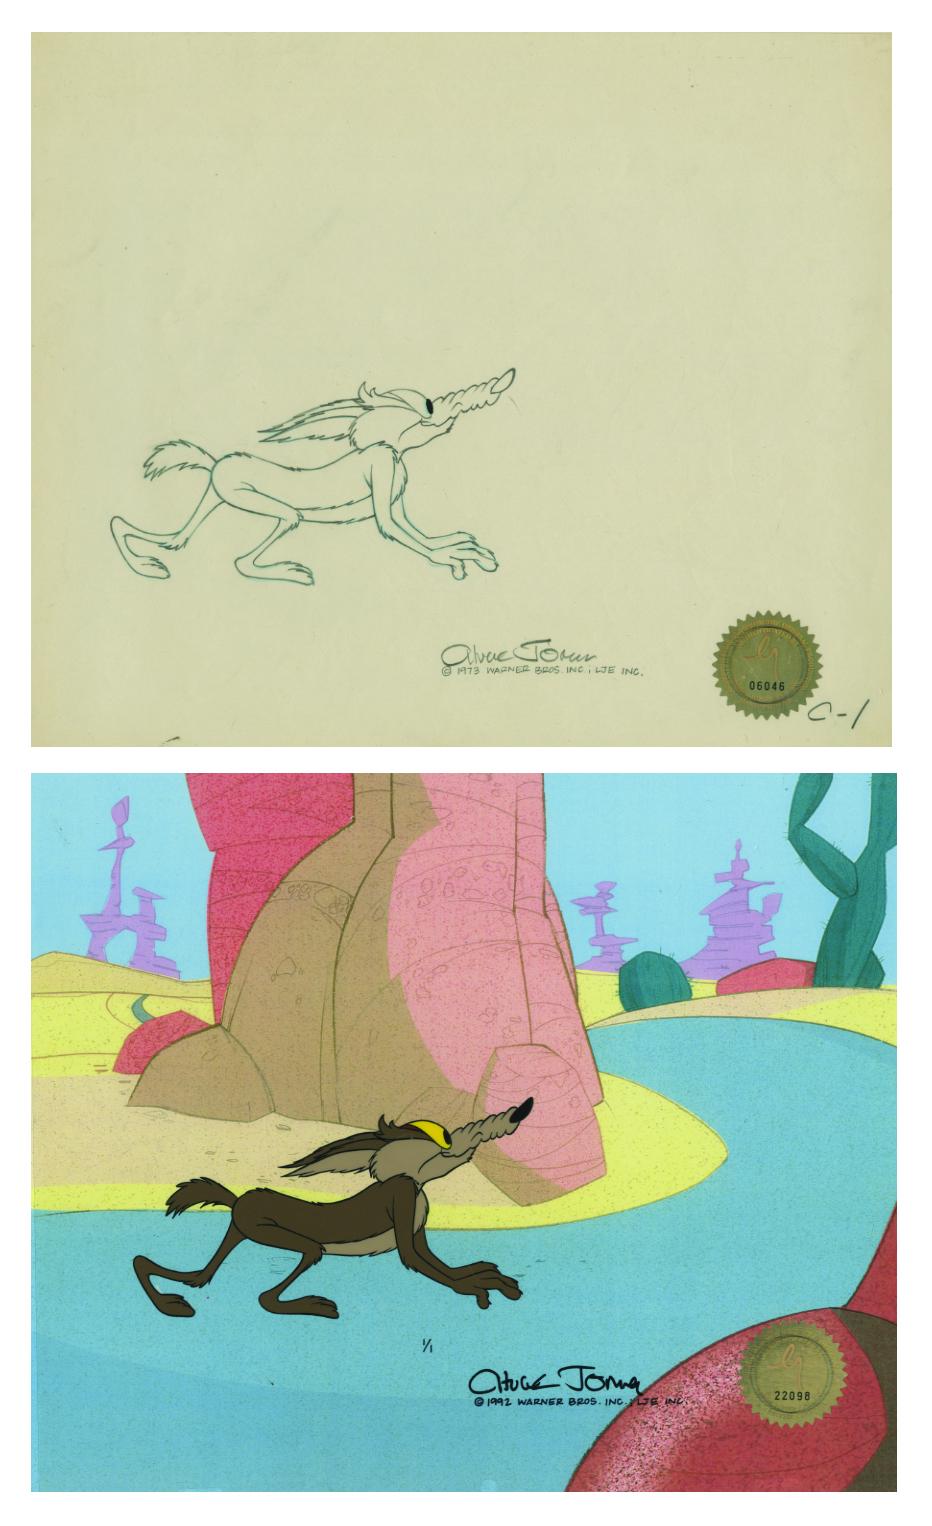 Hand Drawn /& Hand Painted Cel Warner Bros Looney Tunes Coyote /& Rod Runner